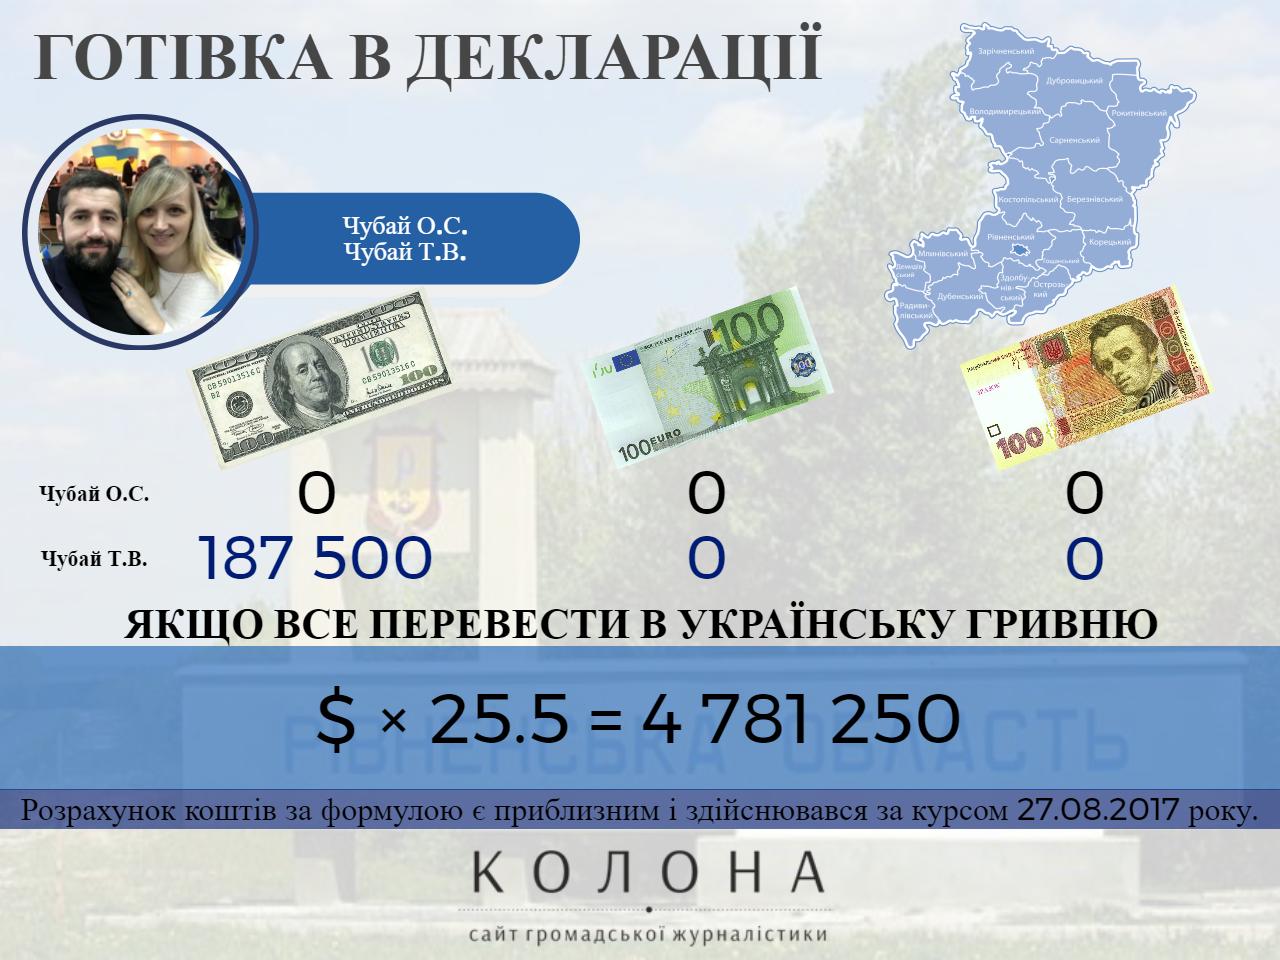 Чубай Олександр Степанович, Чубай Тетяна Василівна